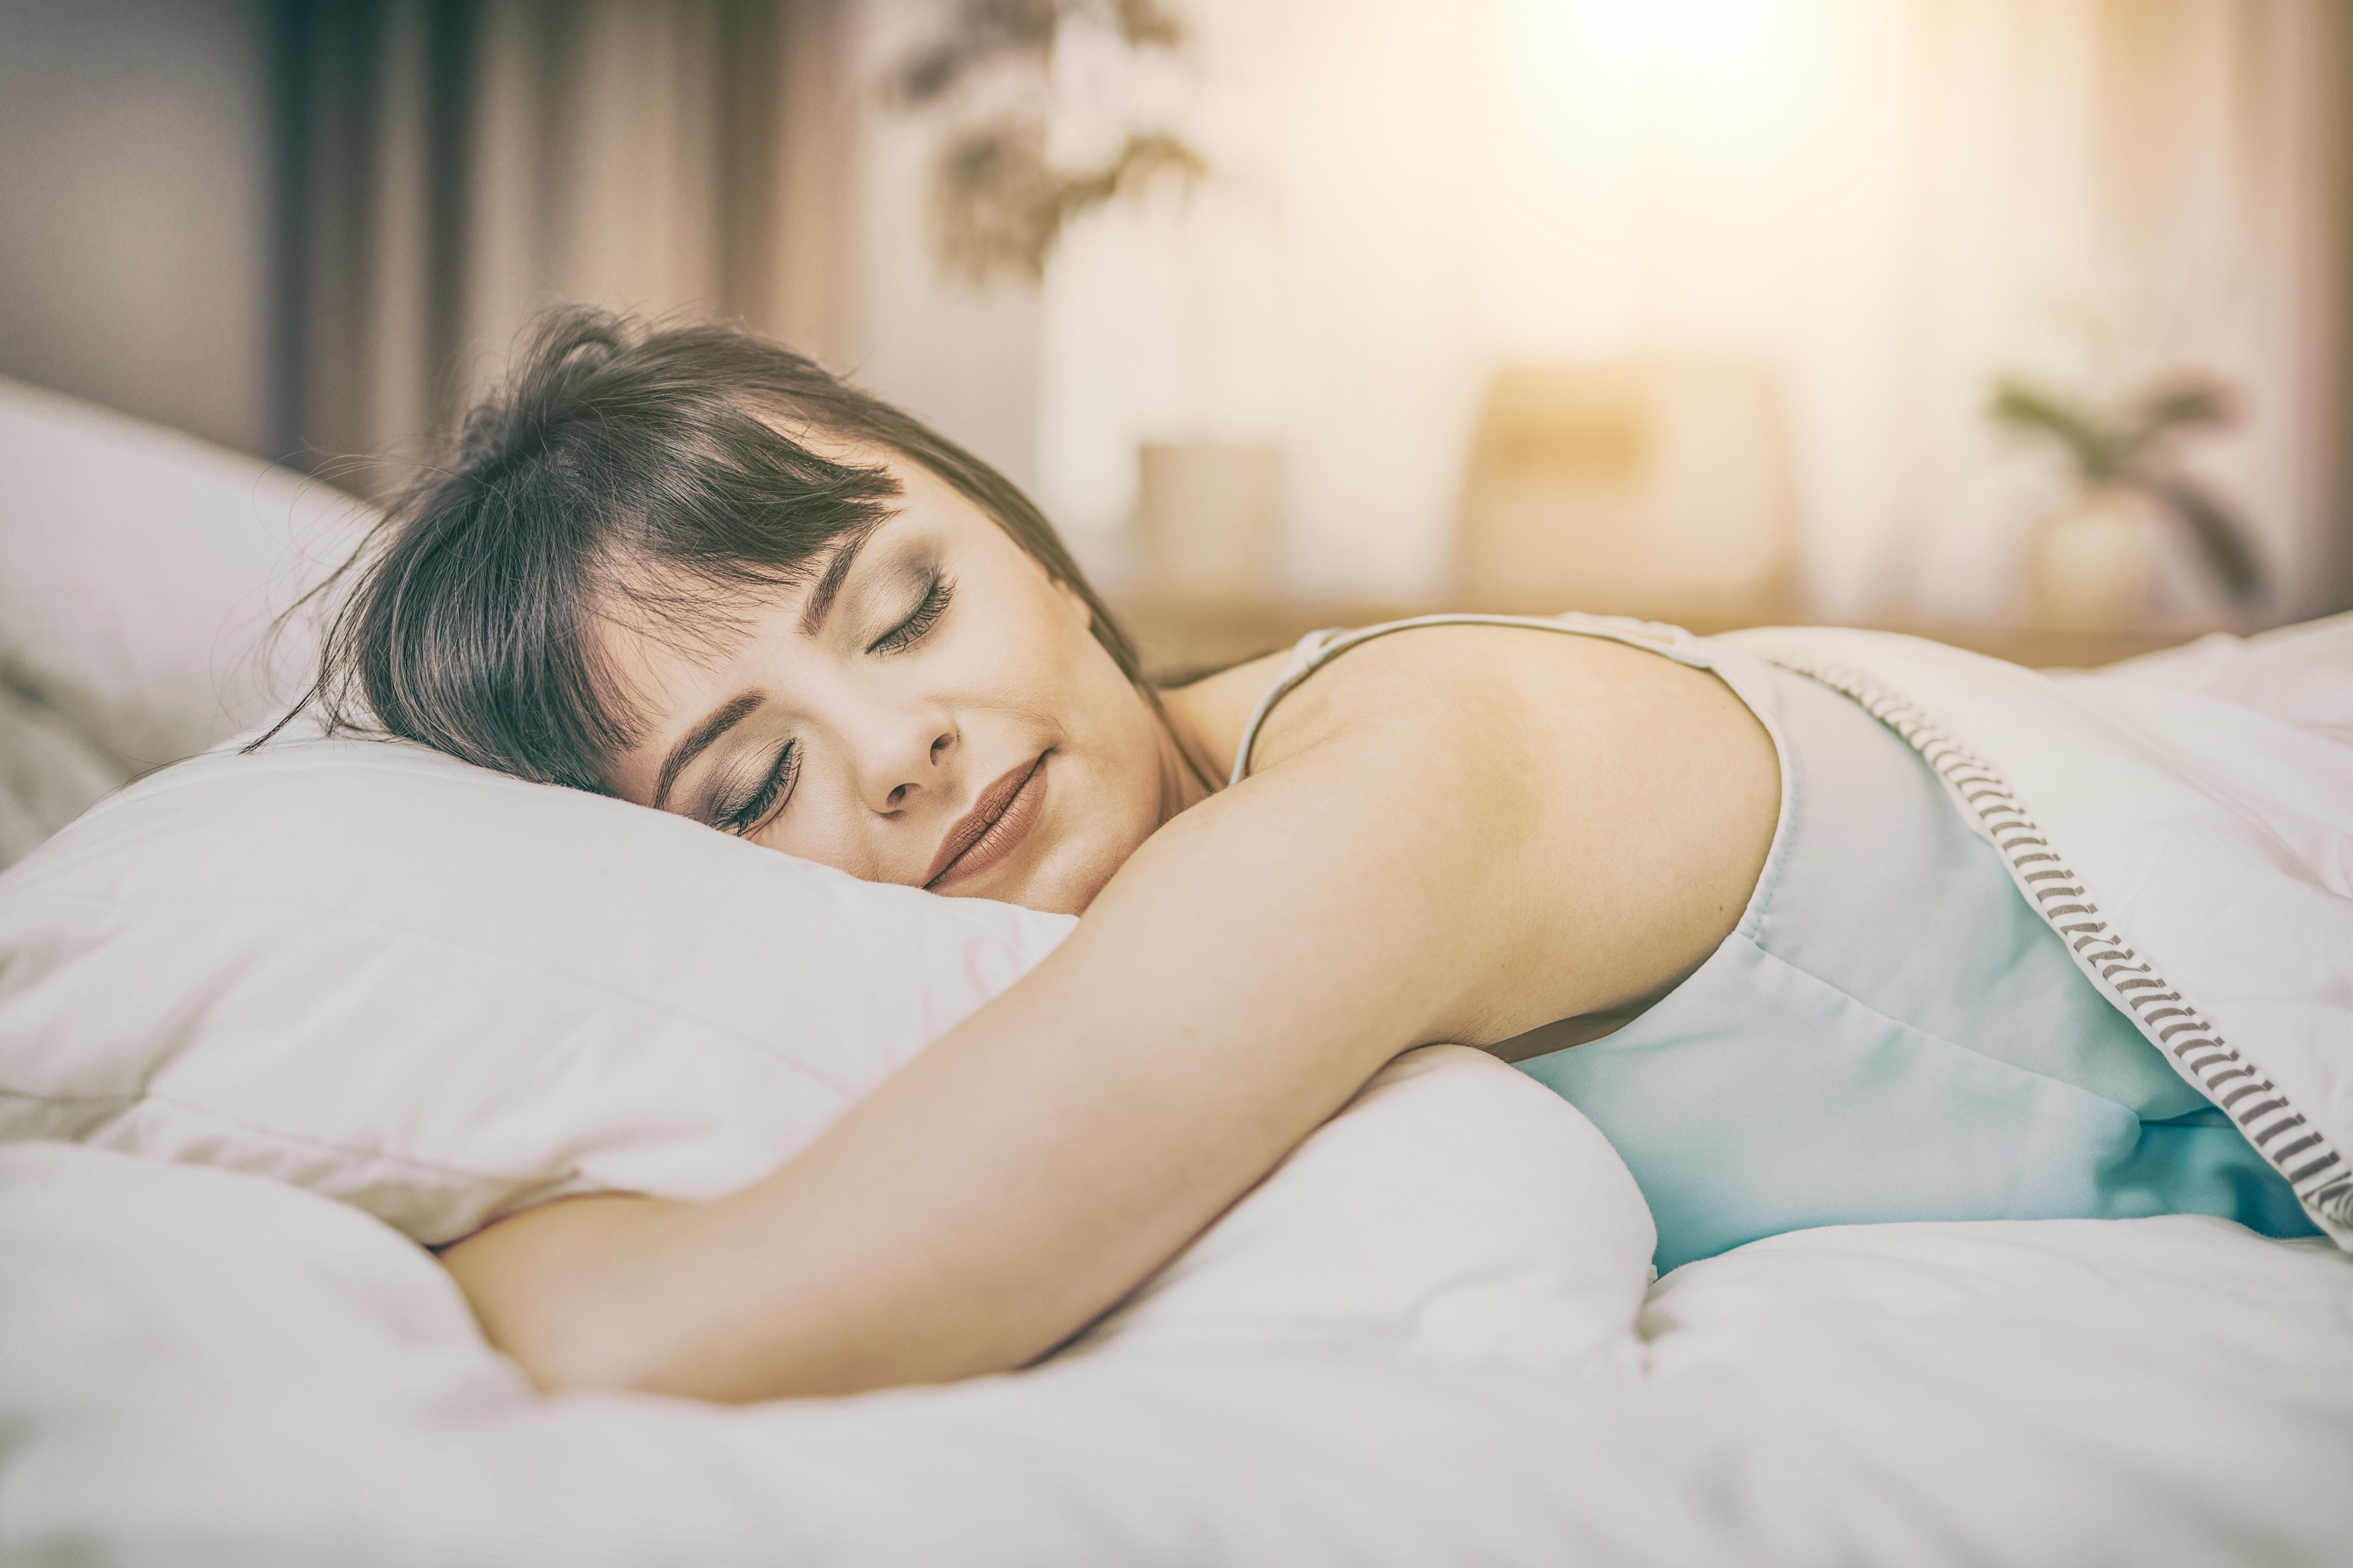 Sleep helps to curb carb cravings